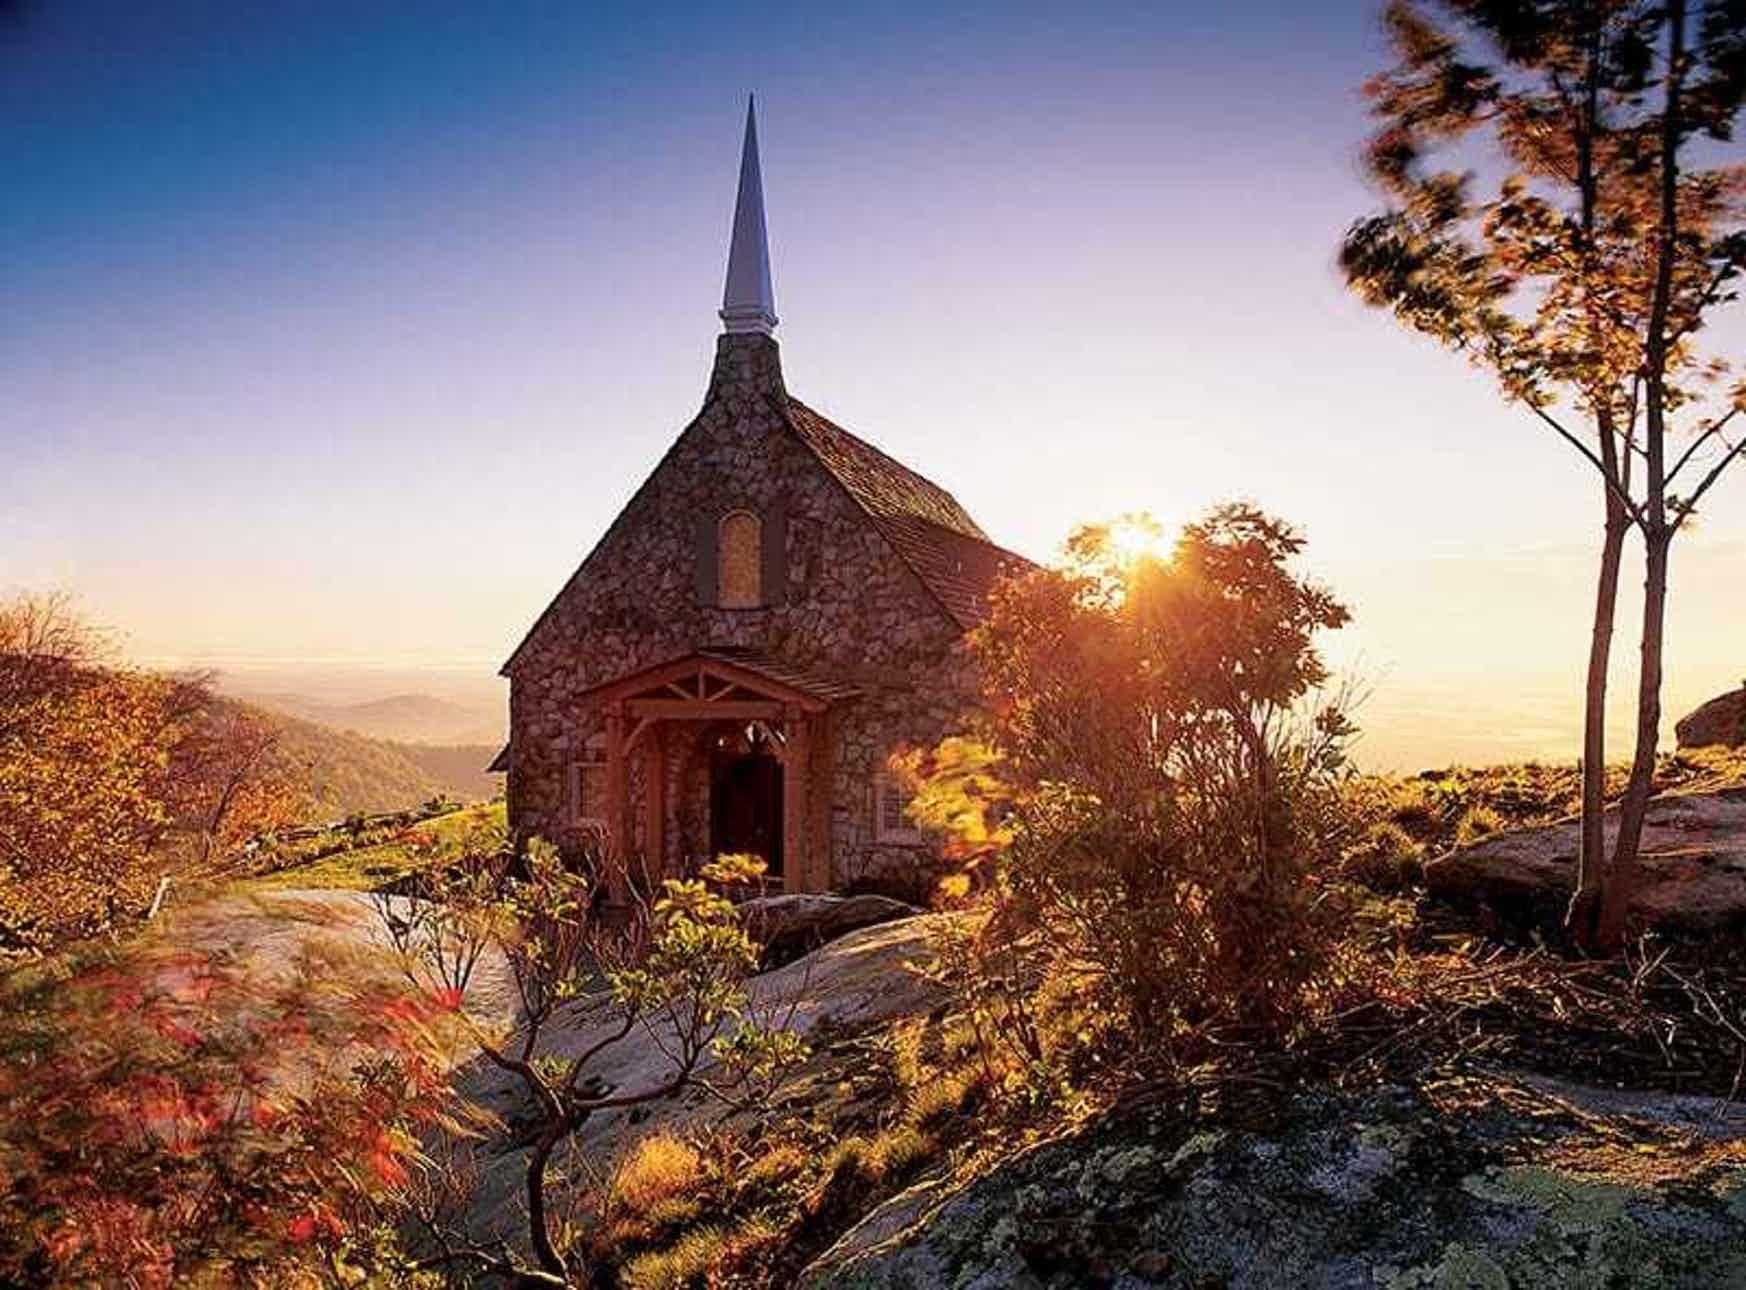 The Cliffs At Glassy Wedding Venue Travelers Rest Sc 29690 Pretty Place Chapel South Carolina Wedding Pretty Places